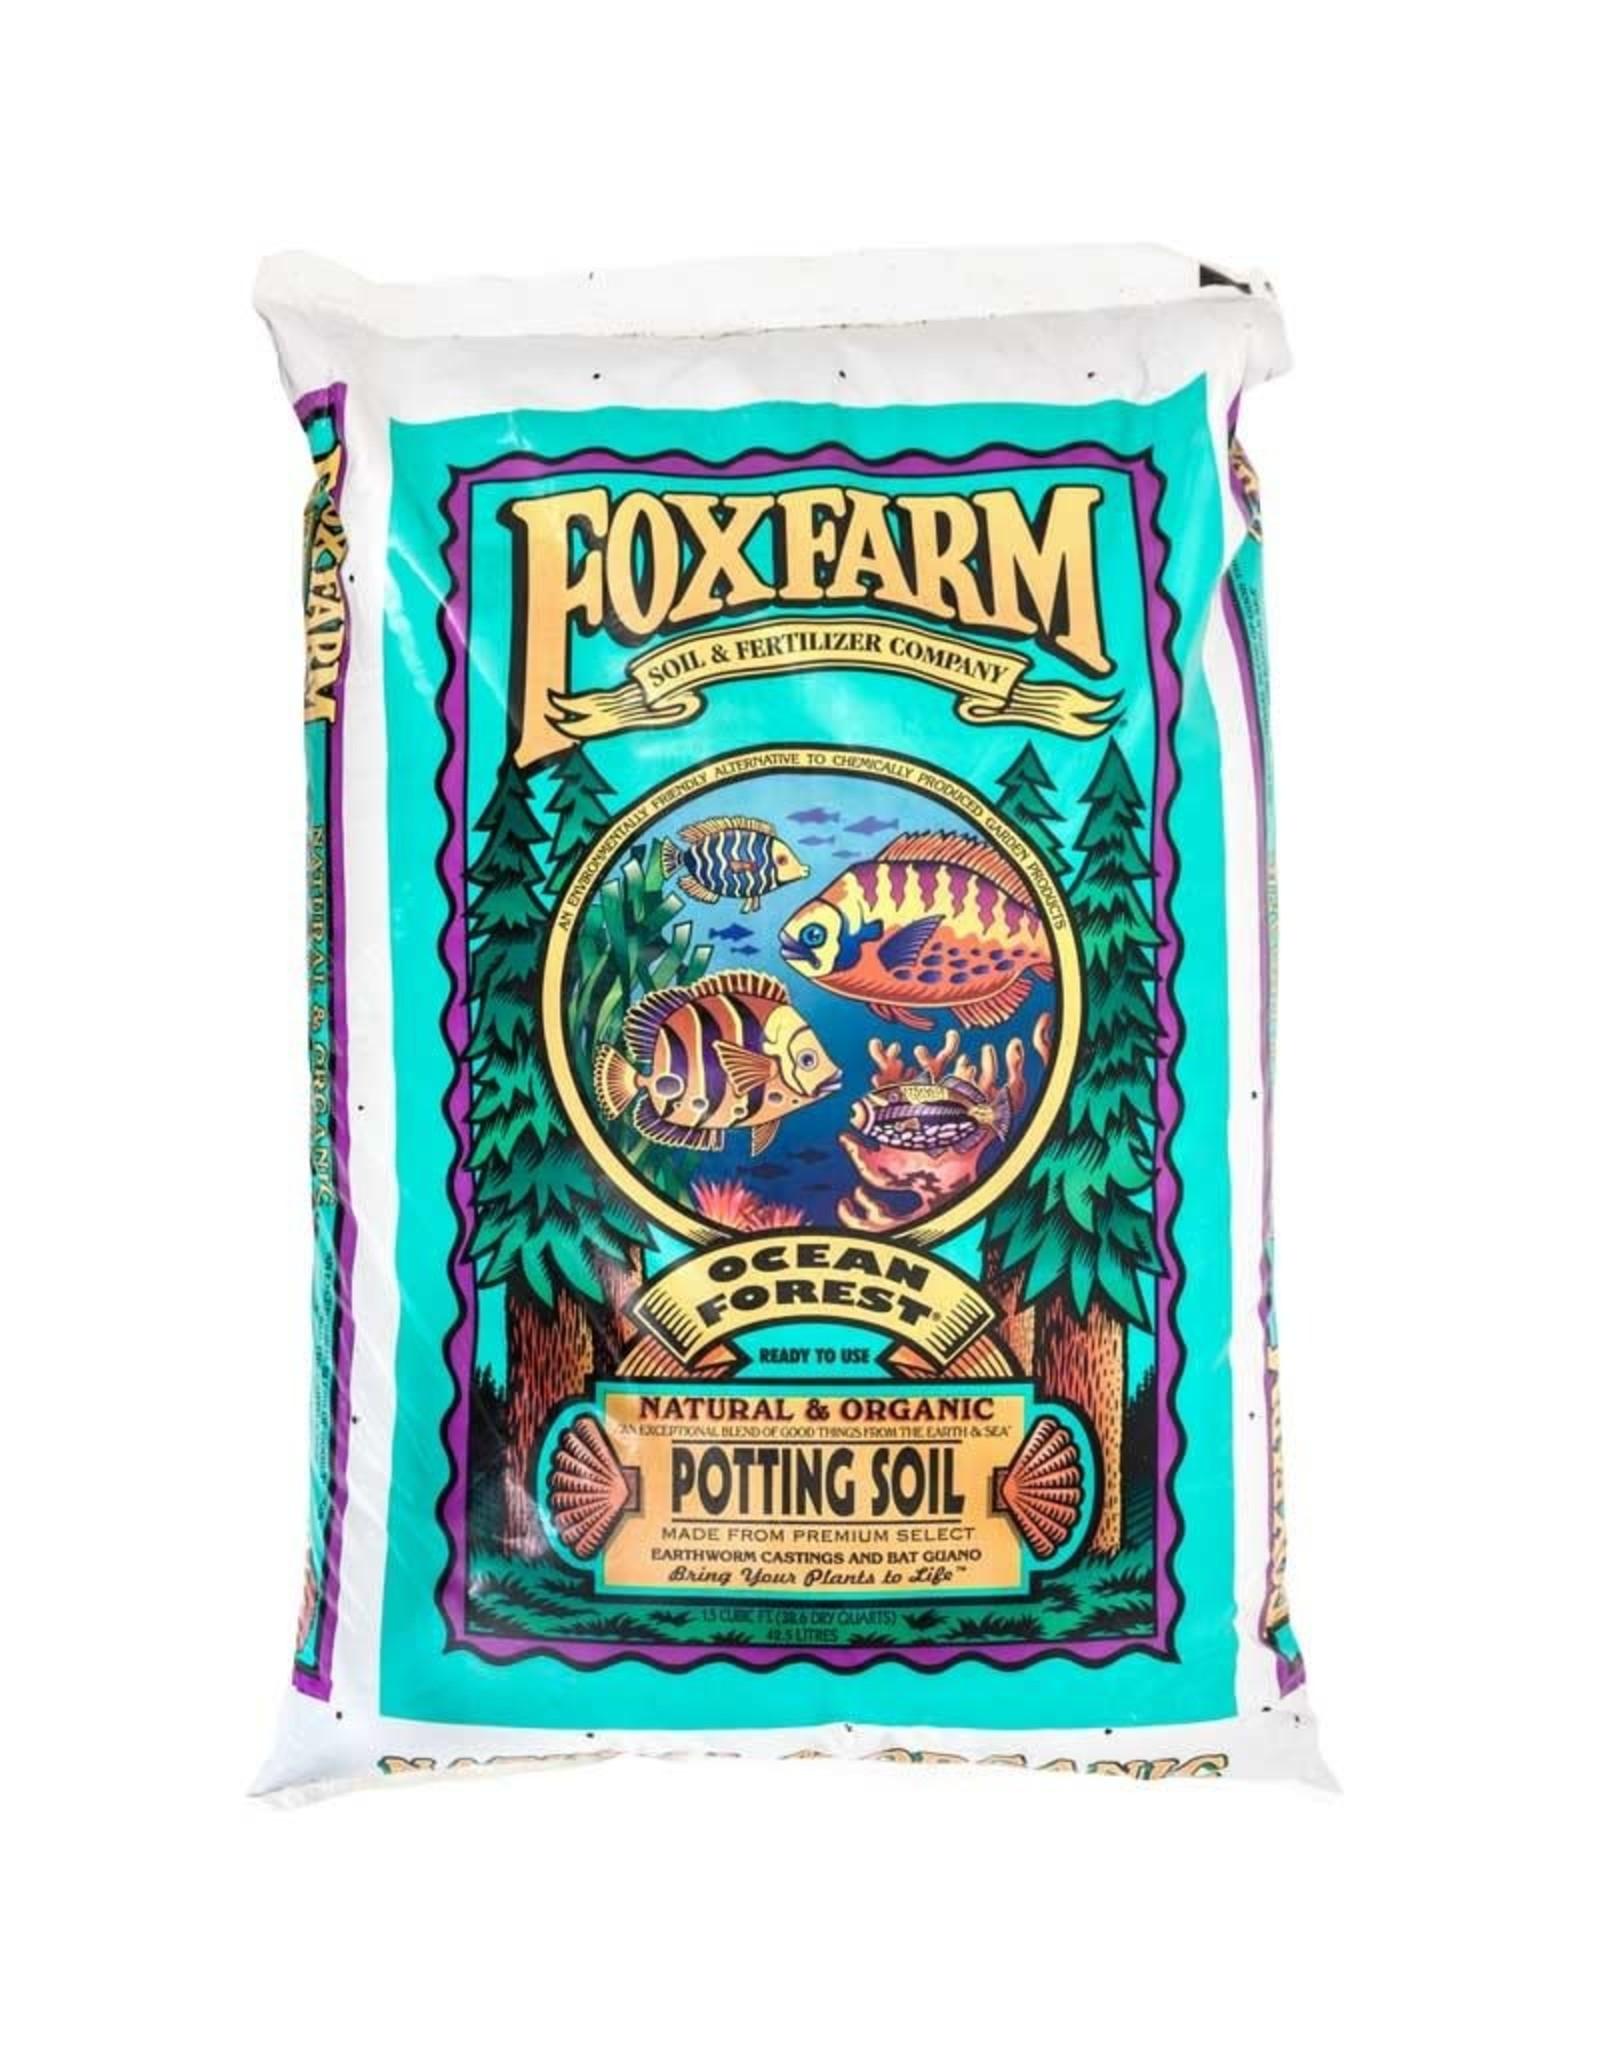 Potting Soil, Ocean Forest - 1.5 cu. ft.